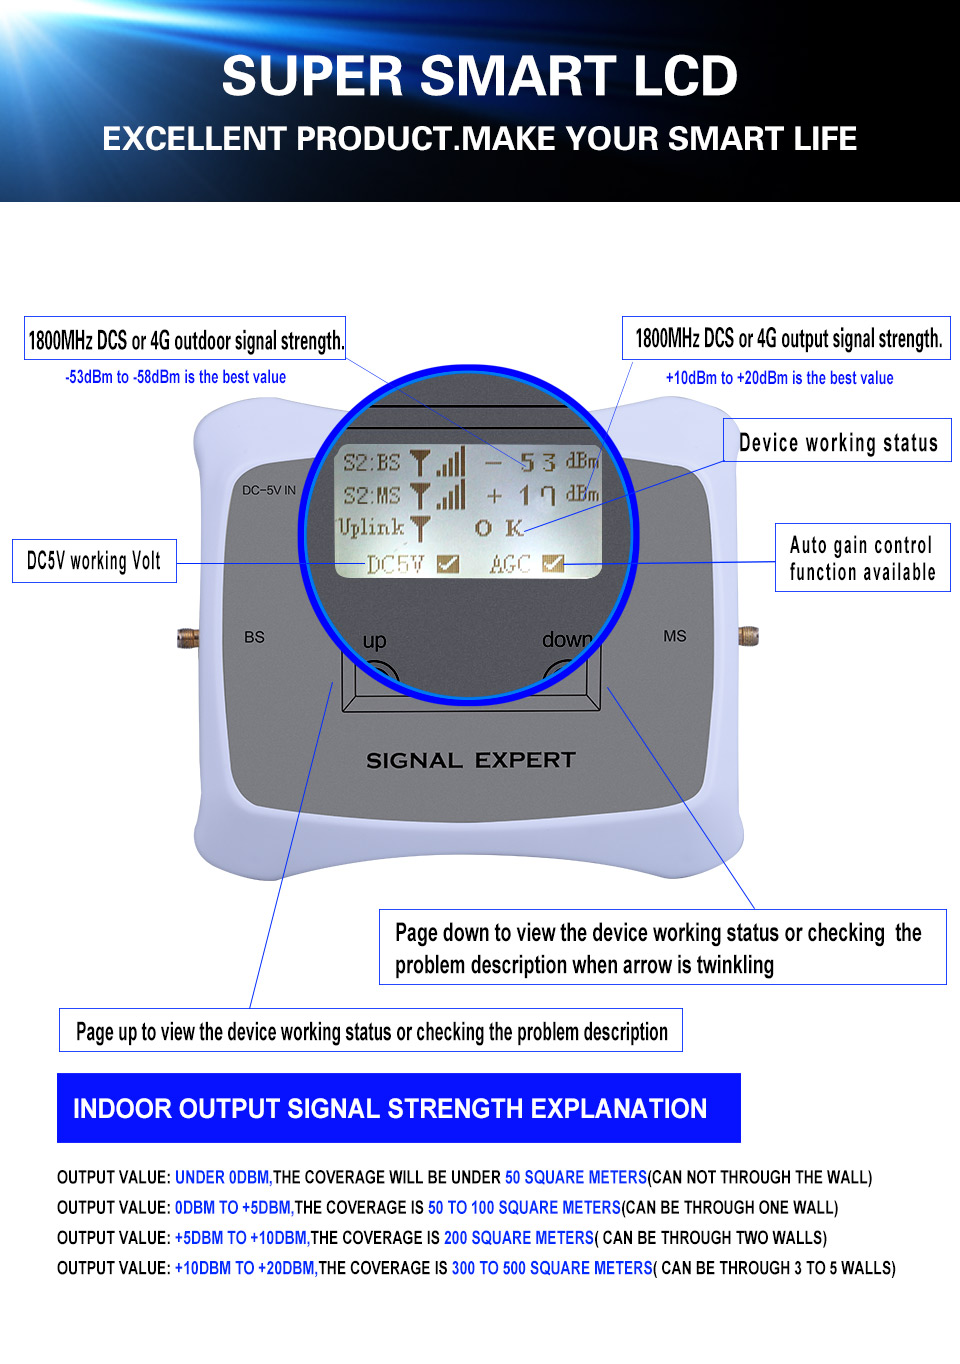 Двухдиапазонный репитер AT-1872-DW 1800 MHz + 2100 MHz, 400-600 кв. м. - фото 1800